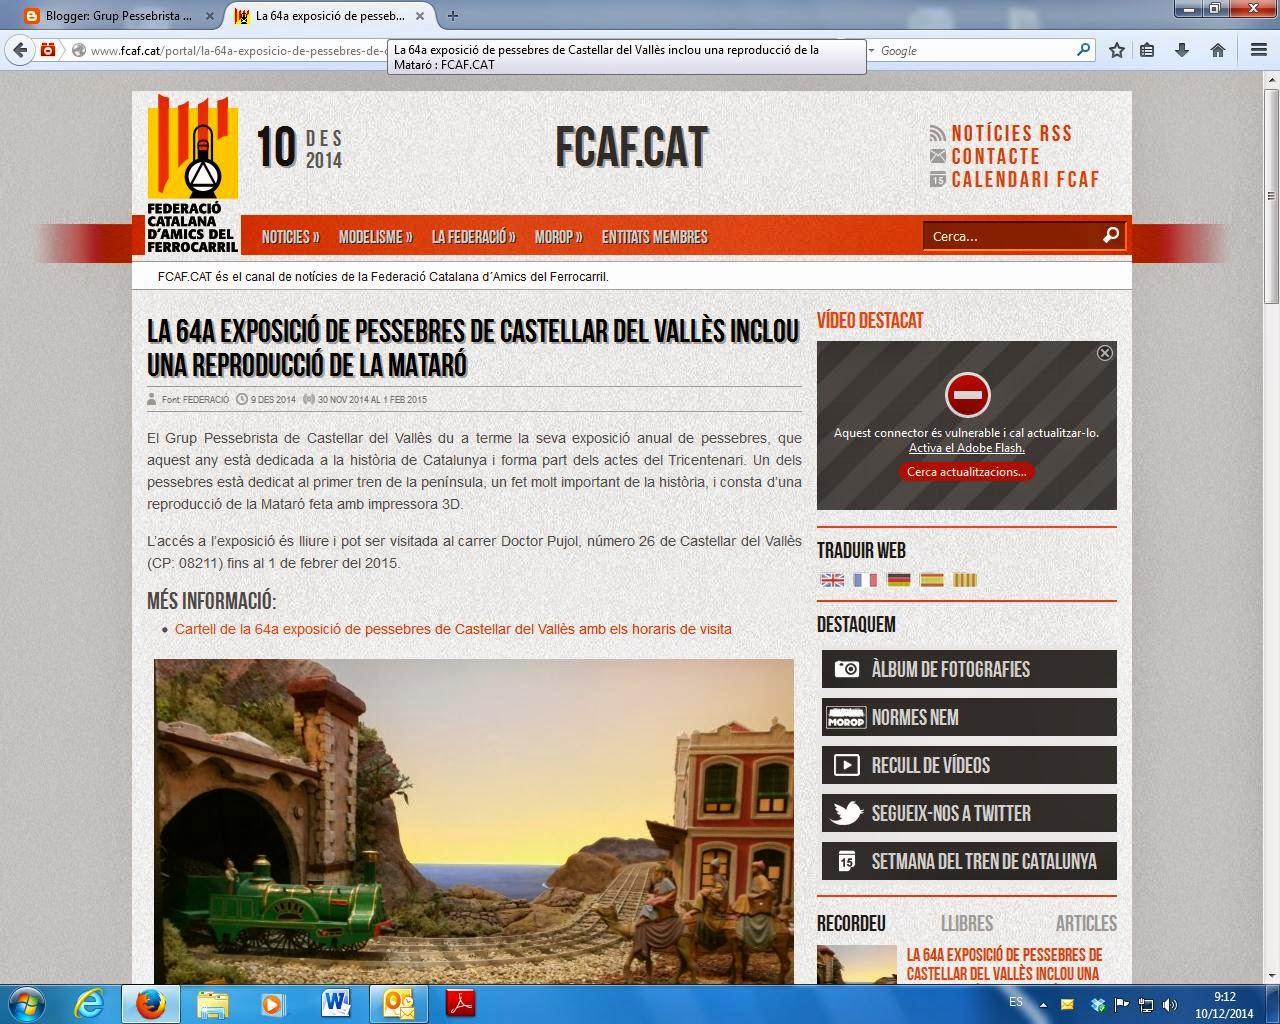 http://www.fcaf.cat/portal/la-64a-exposicio-de-pessebres-de-castellar-del-valles-inclou-una-reproduccio-de-la-mataro/